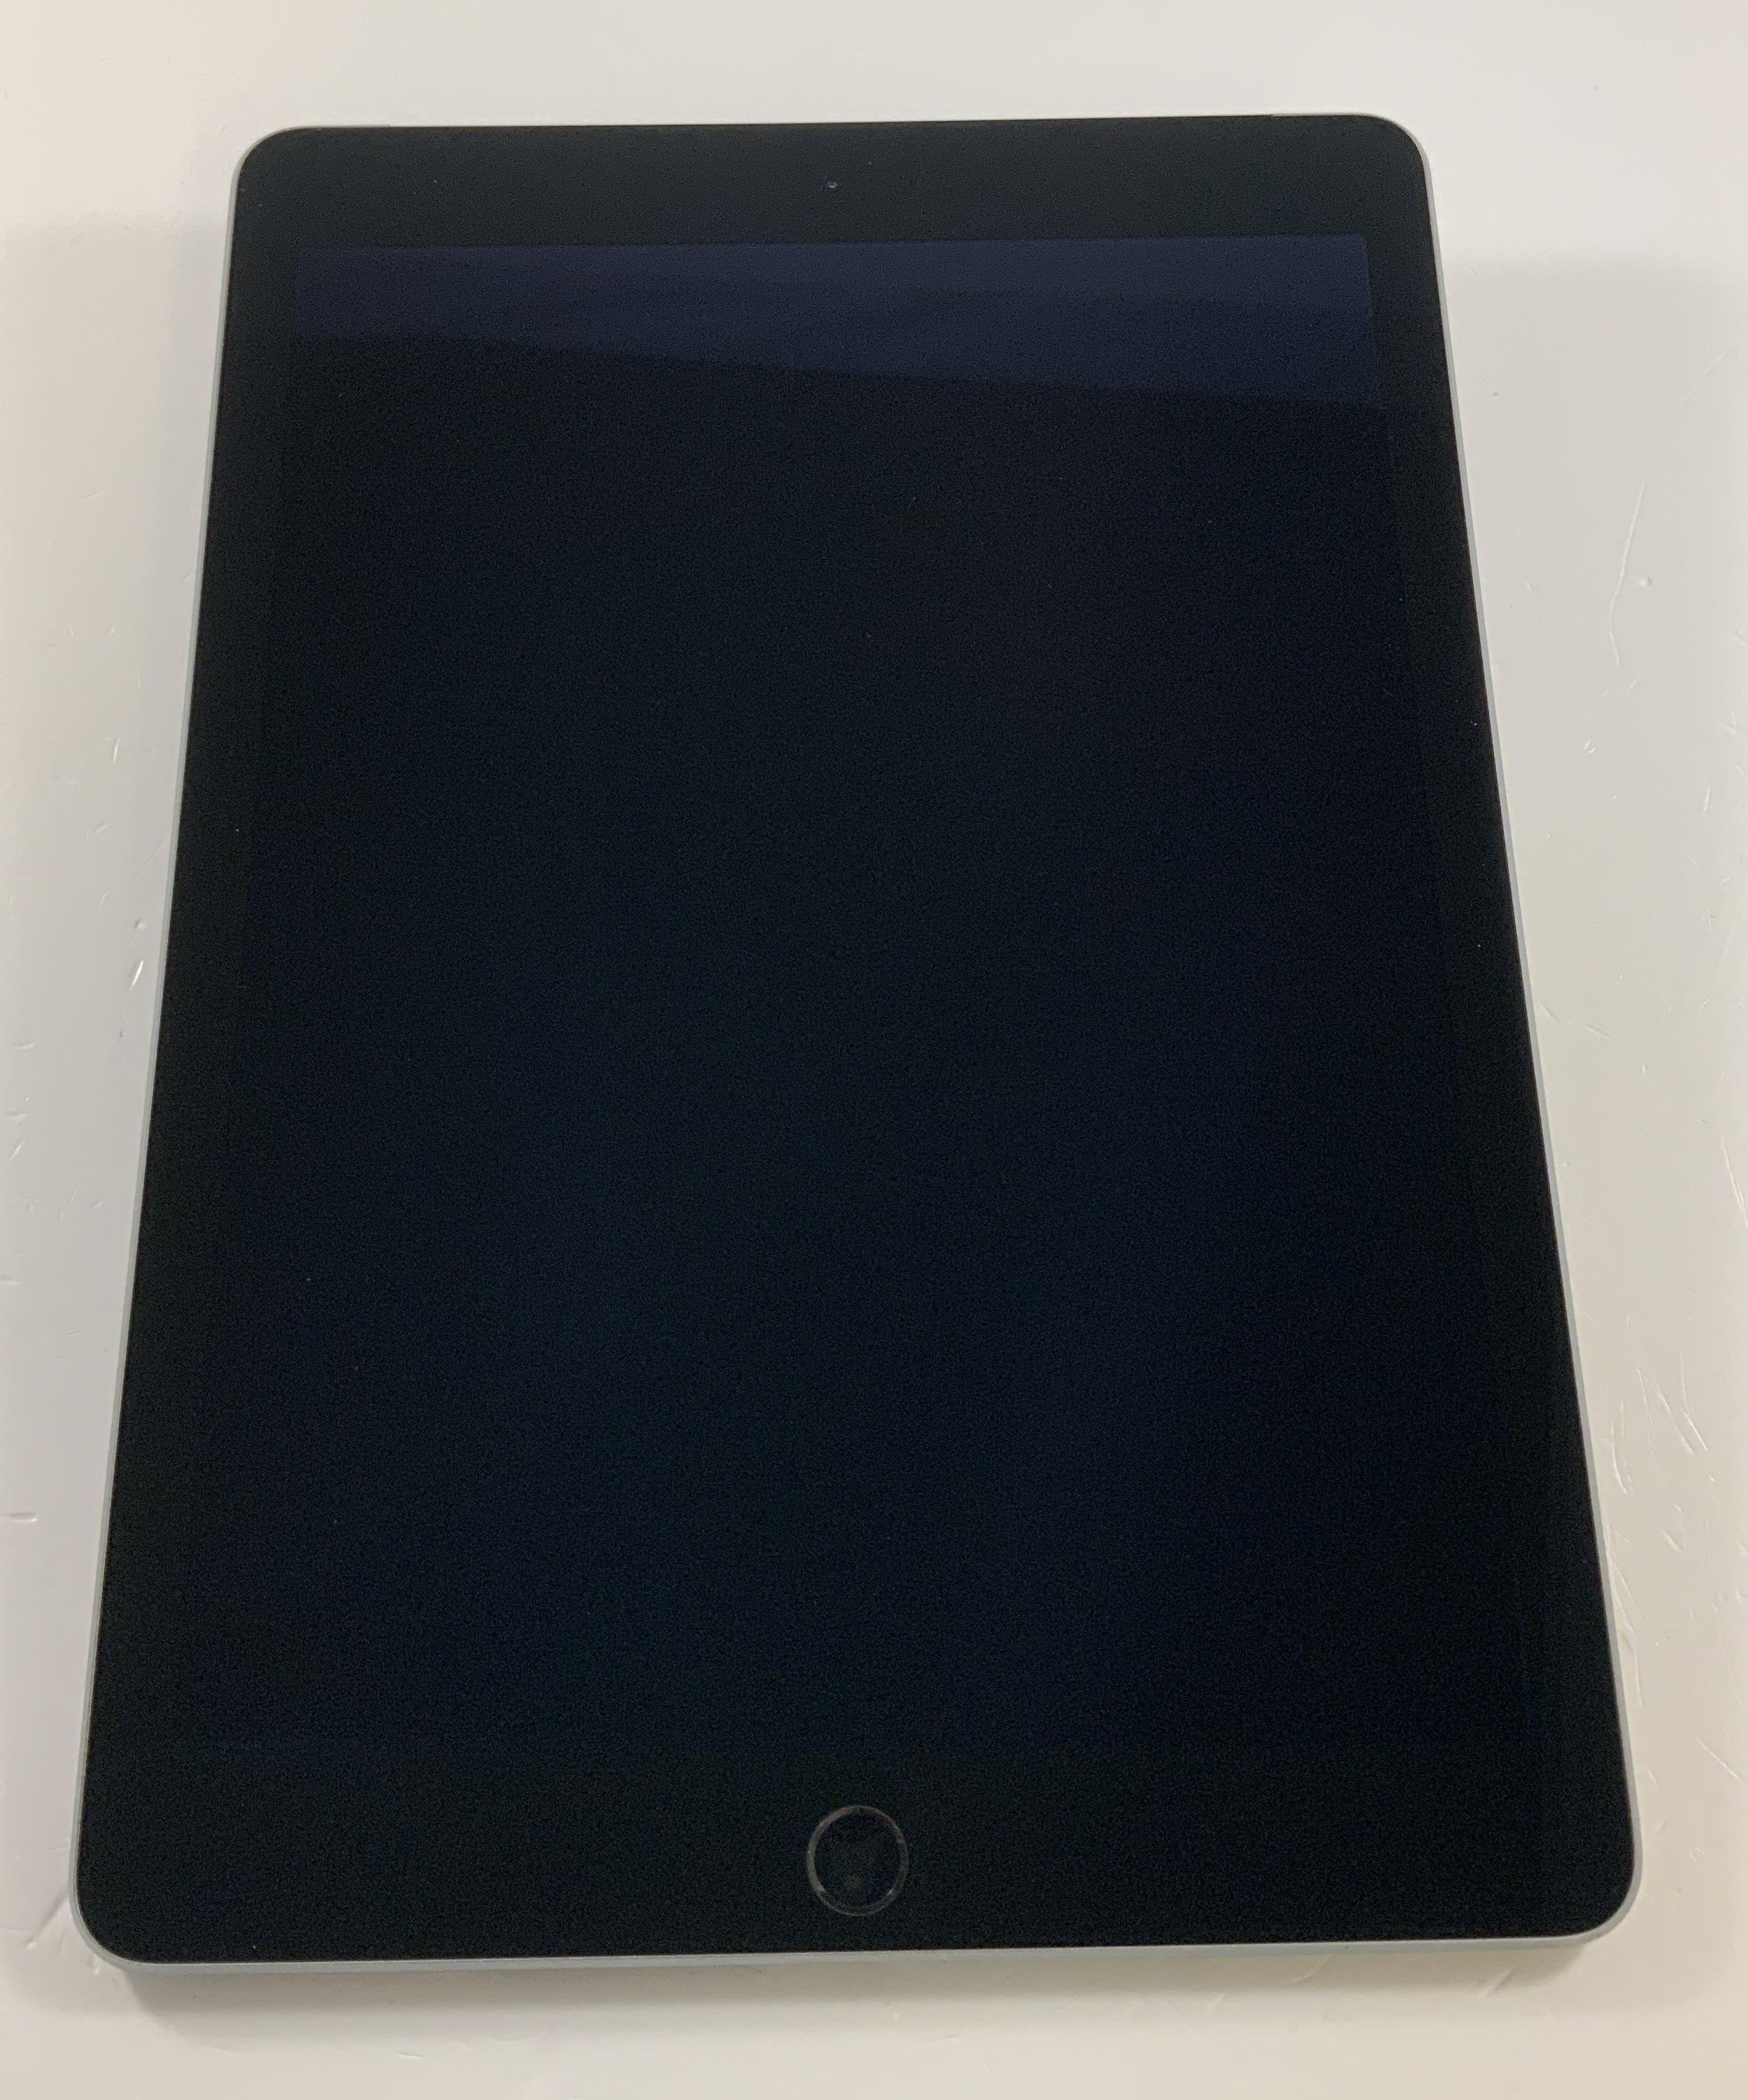 iPad Air 2 Wi-Fi + Cellular 32GB, 32GB, Space Gray, image 1